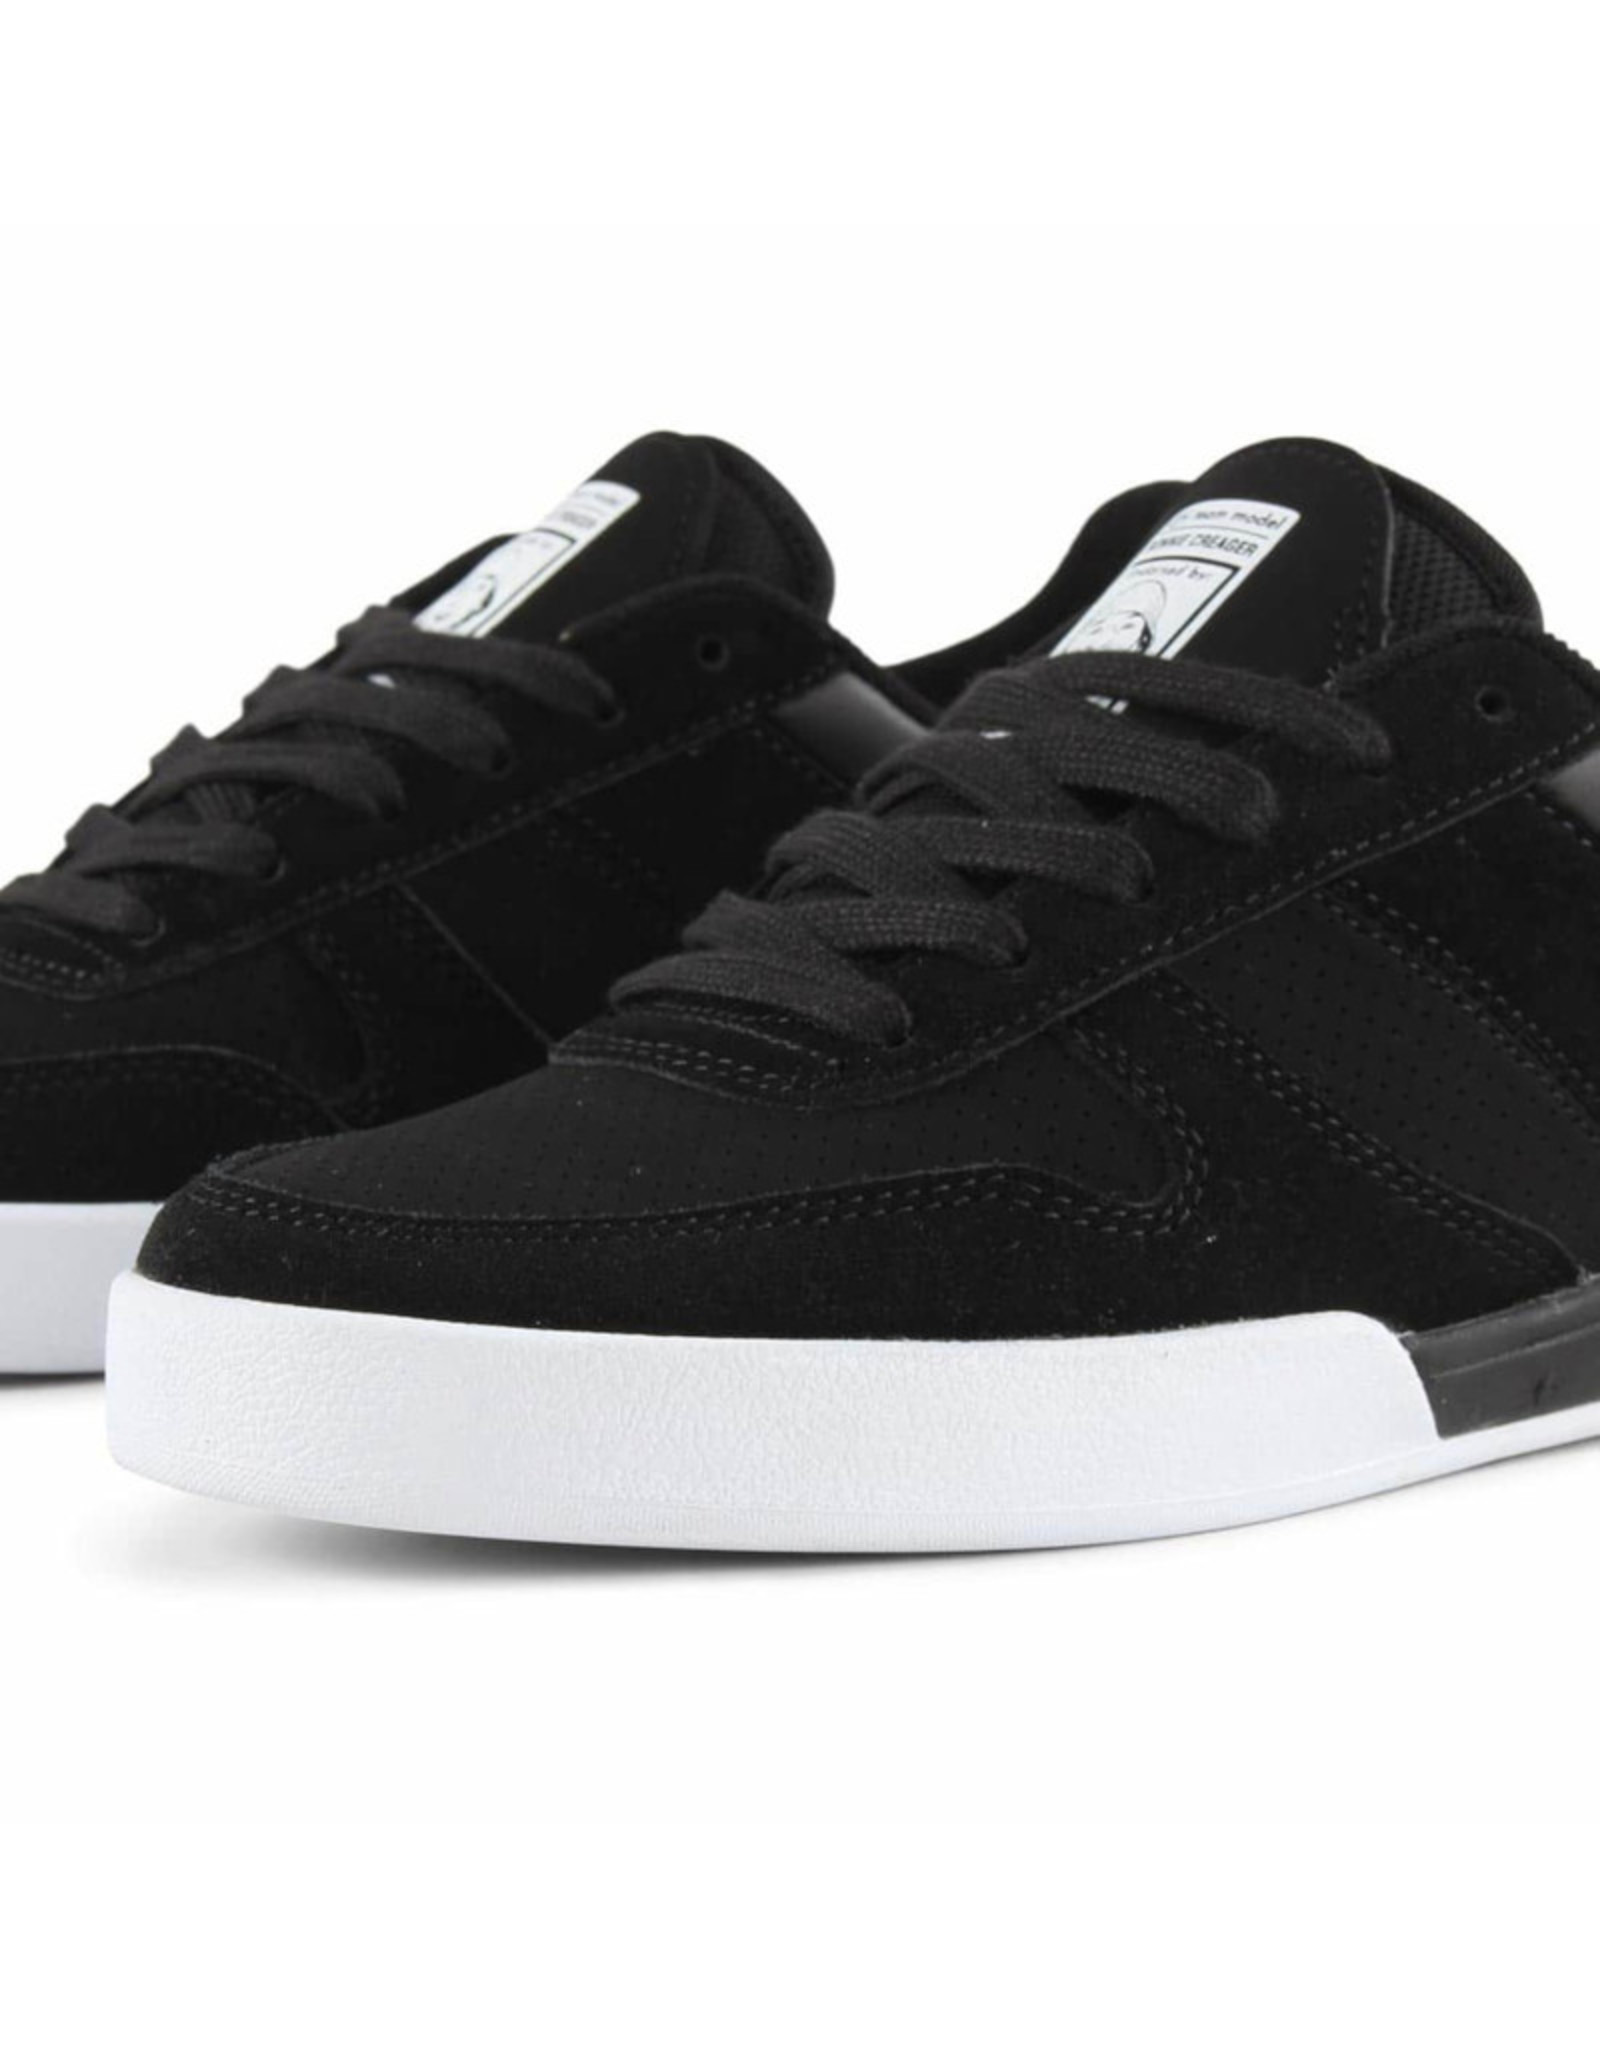 eS Shoes eS Contract Ronnie Creager Shoes (Black)